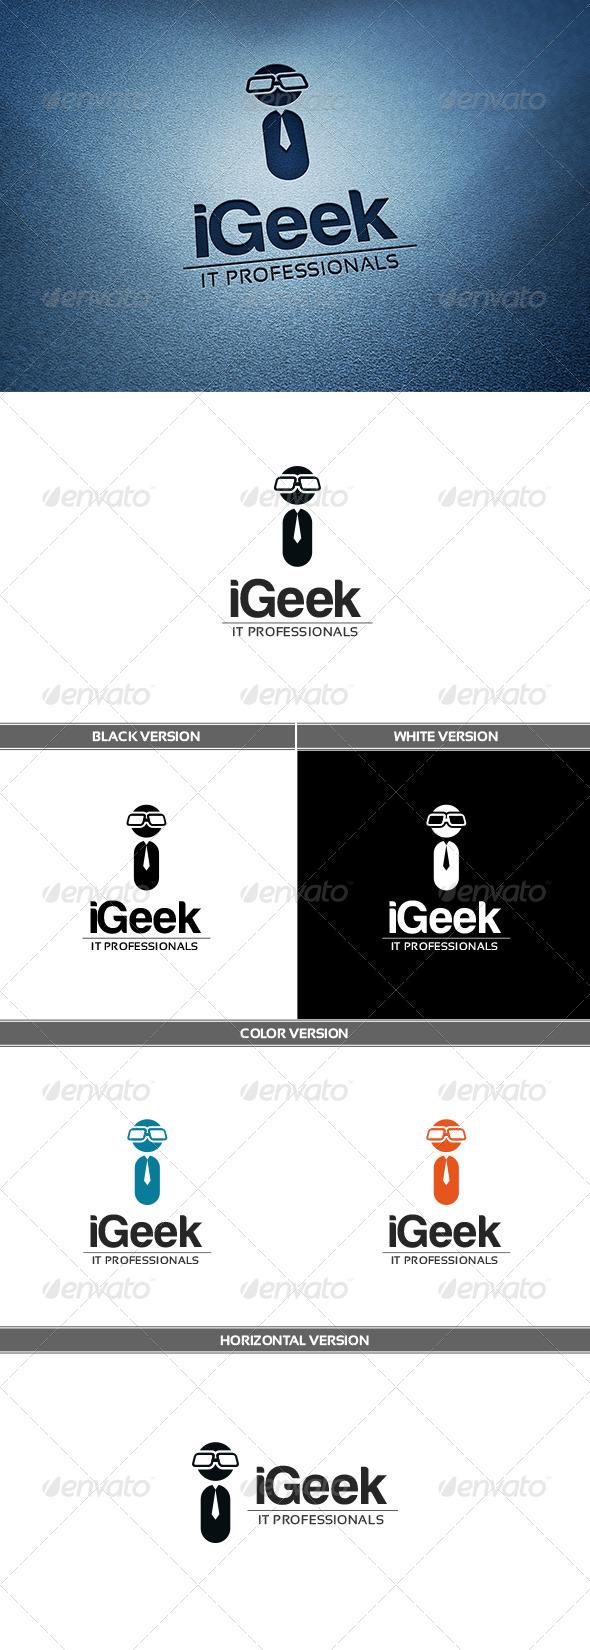 GraphicRiver iGeek Logo 6662297